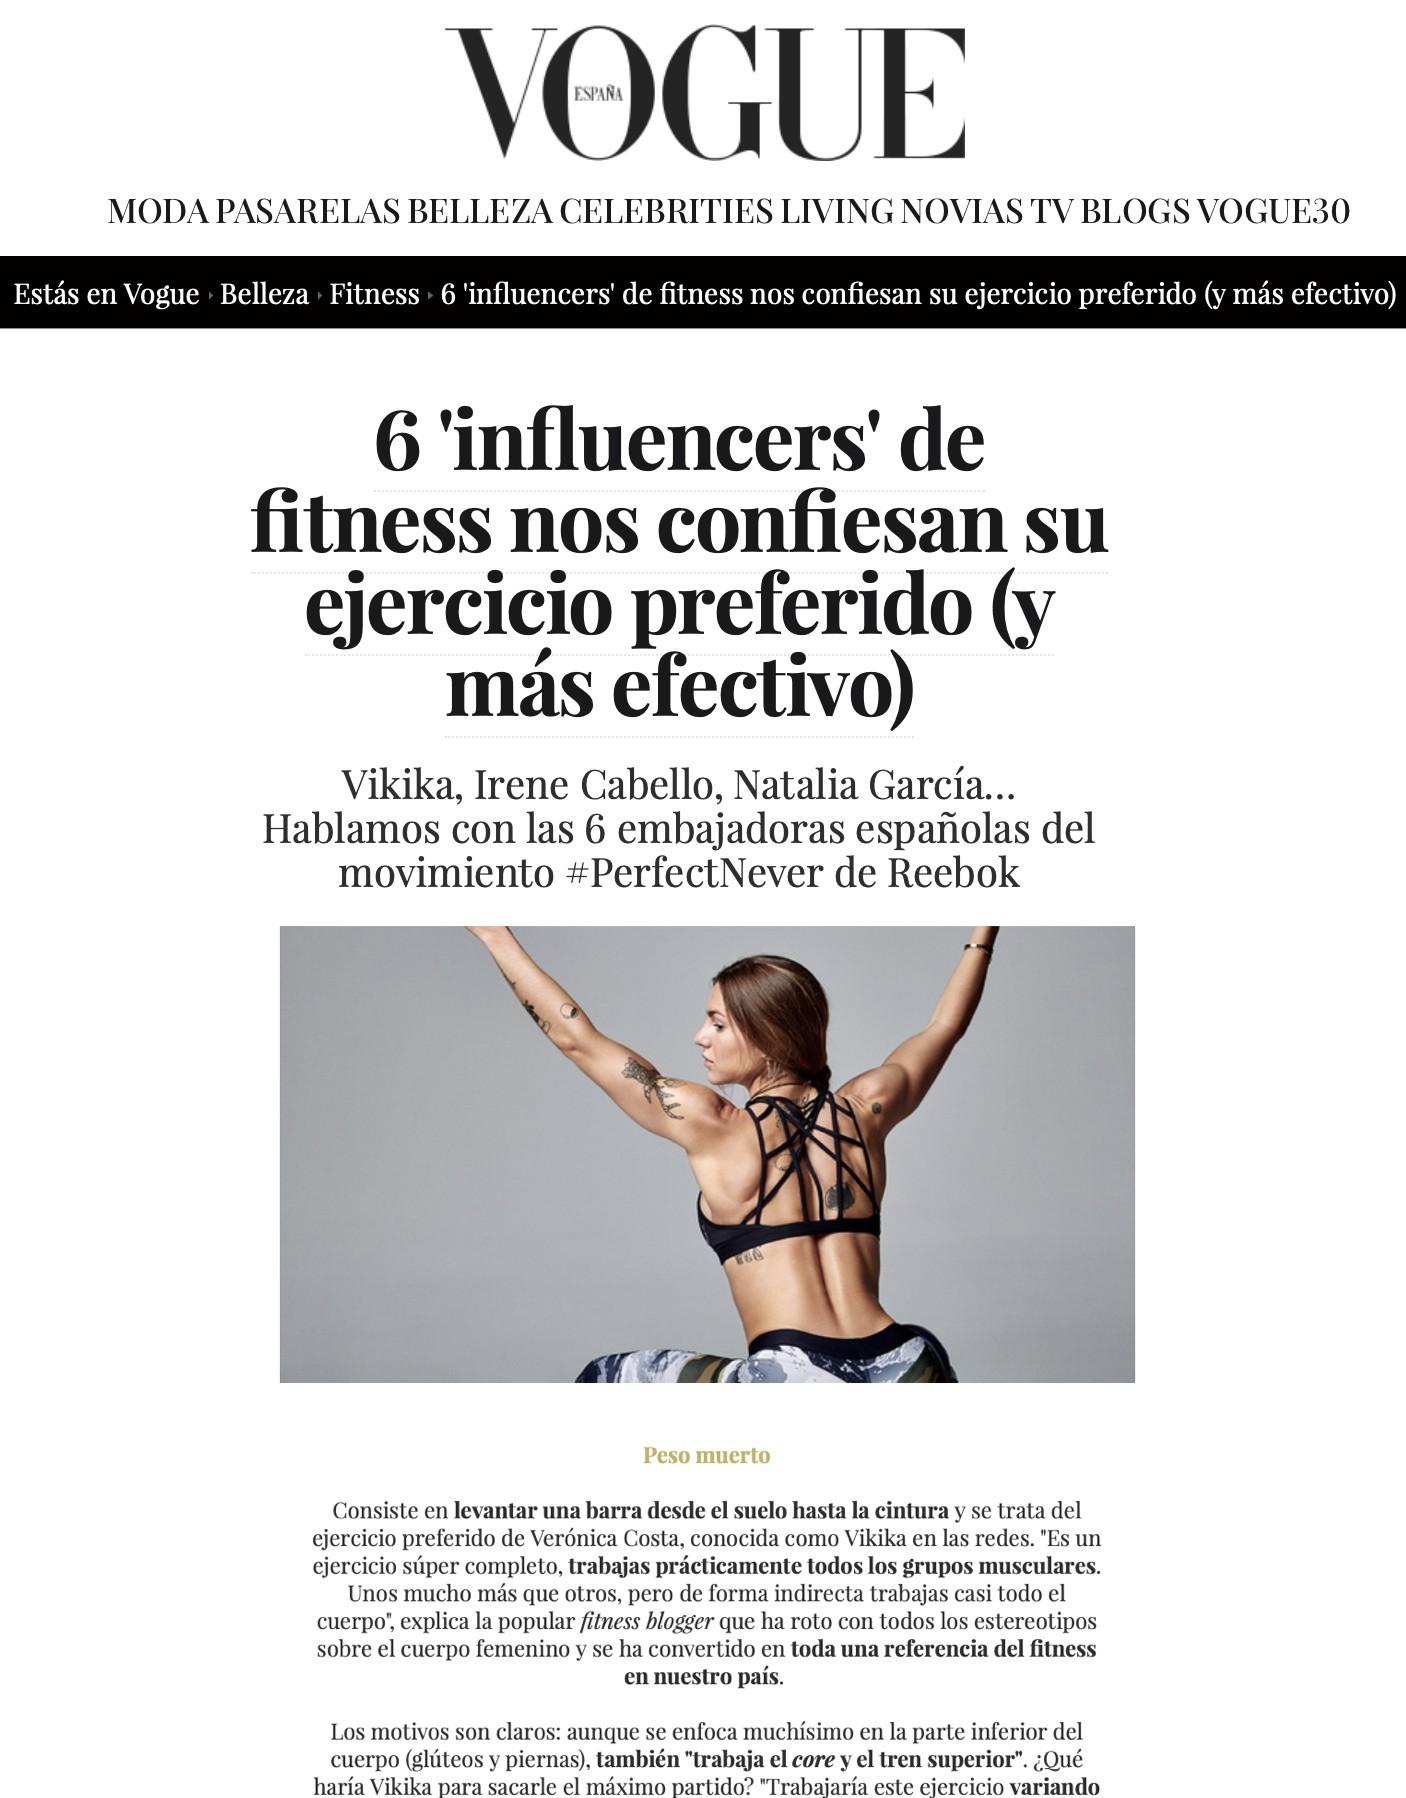 Vogue Belleza Fitness 22 12 16